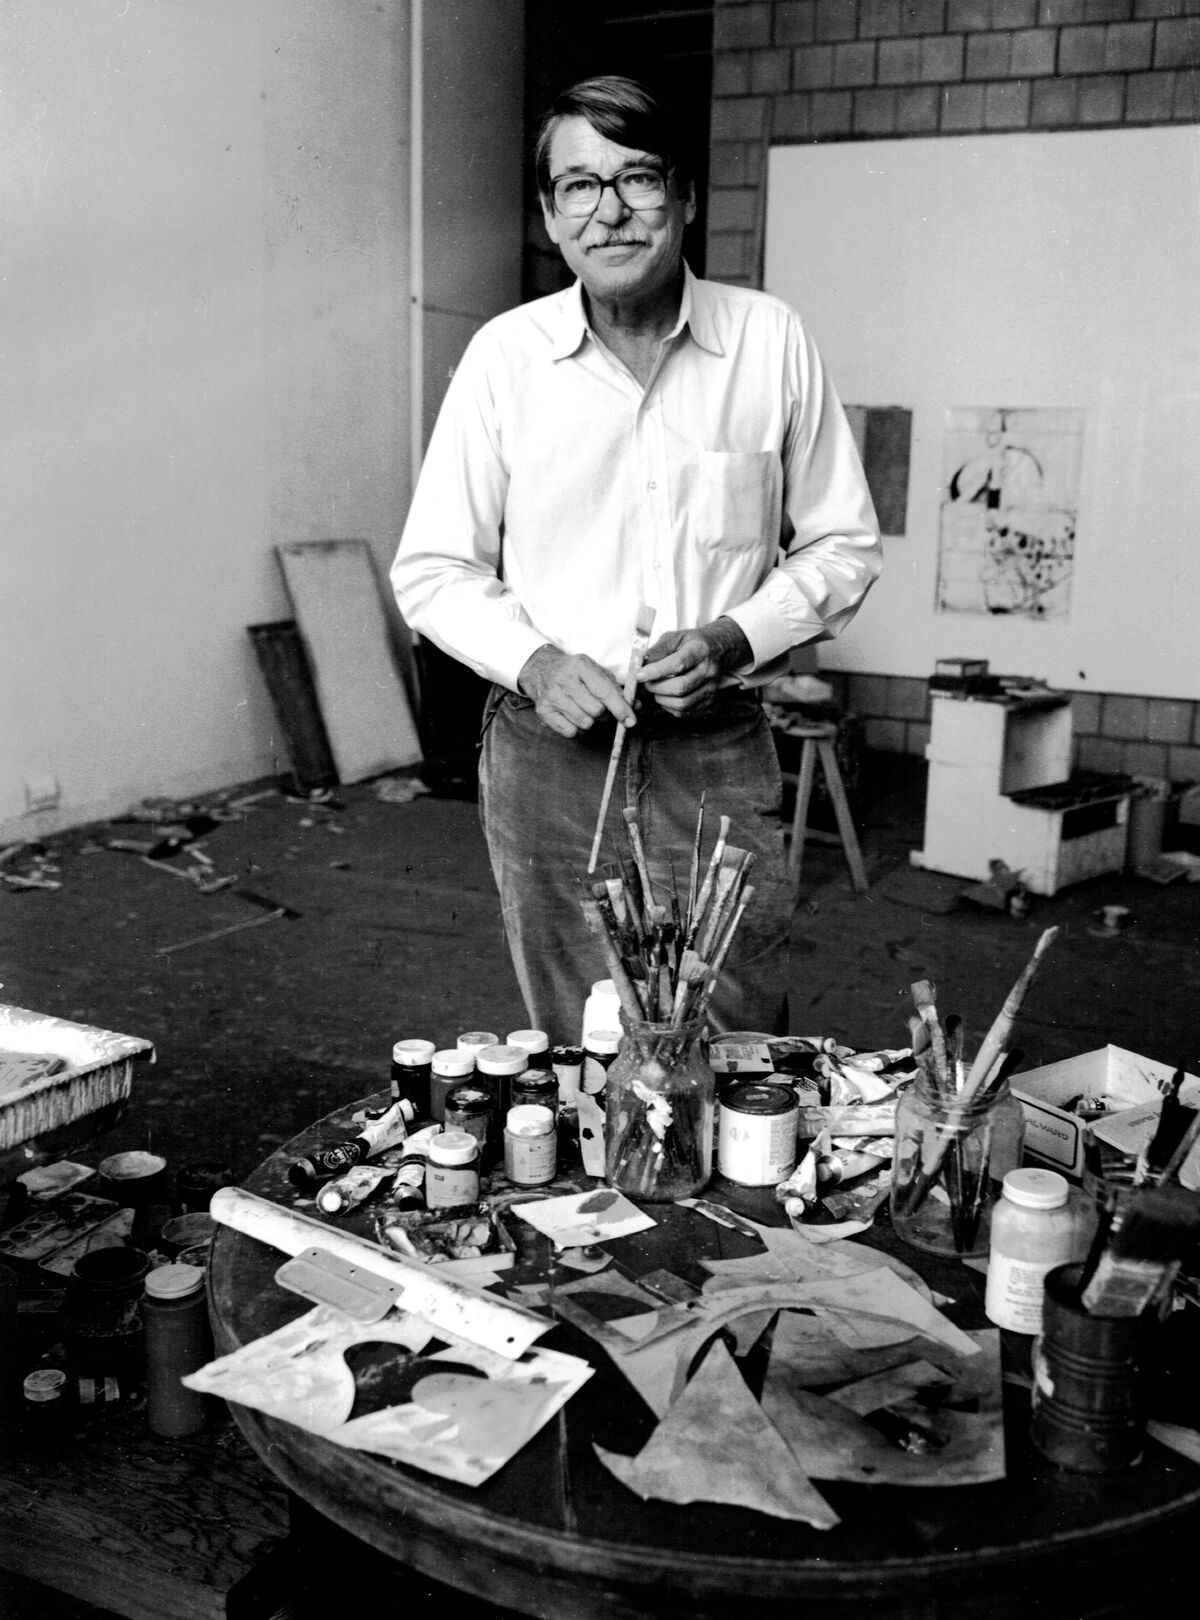 Richard Diebenkorn in his Ocean Park studio, Santa Monica, CA, 1984. Photograph by Leo Holub. Courtesy of the Richard Diebenkorn Foundation.